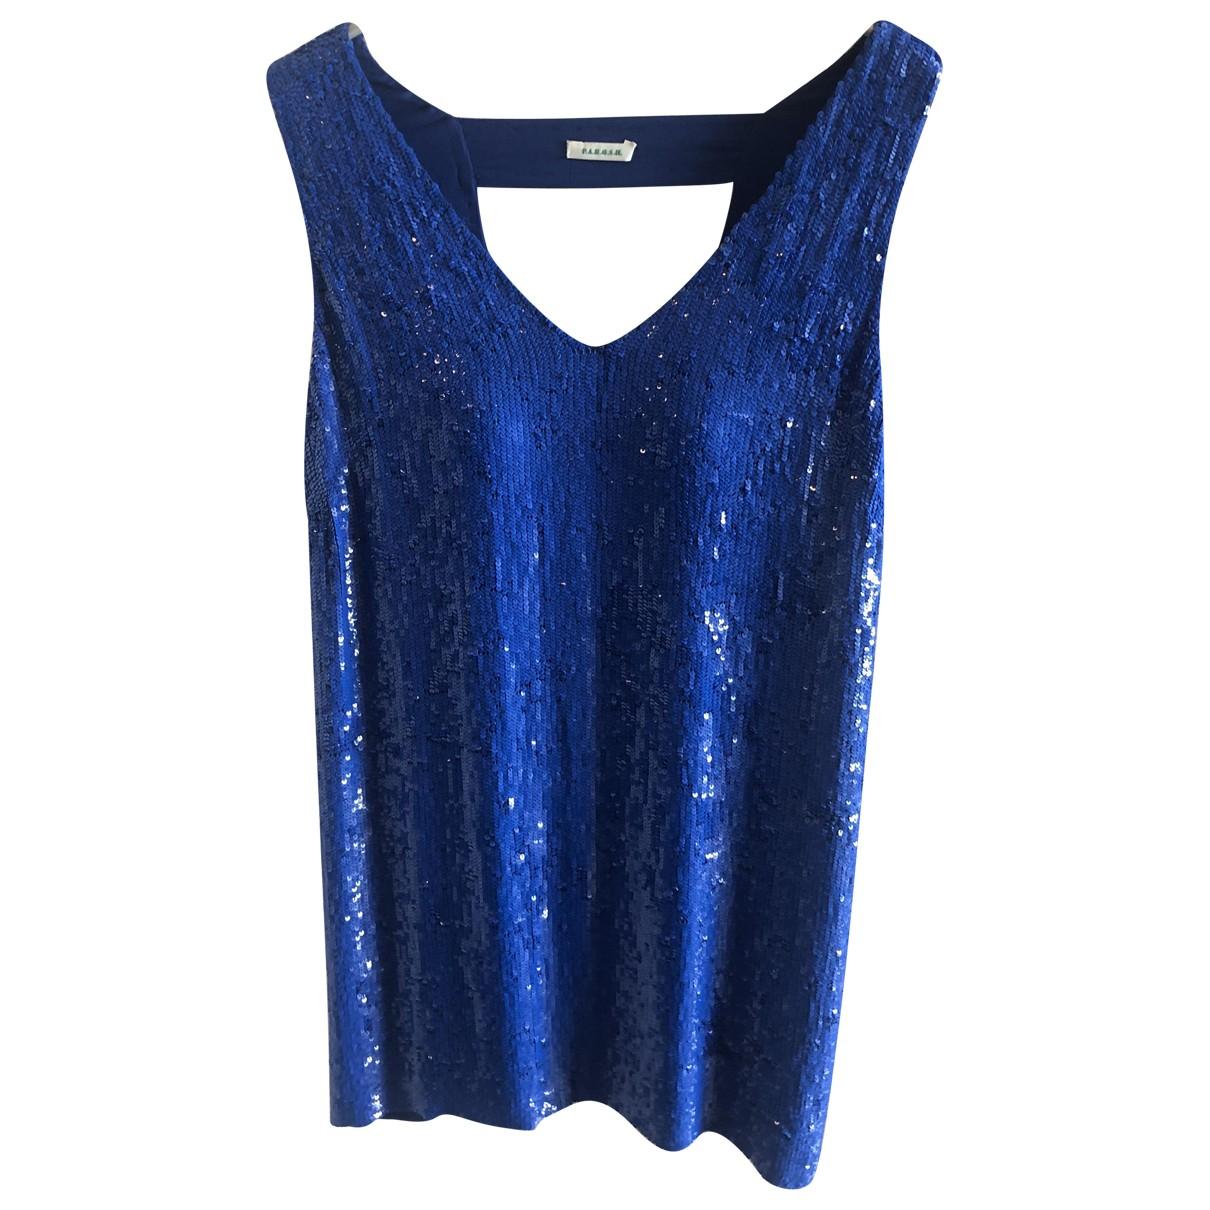 Parosh \N Blue Glitter dress for Women 42 IT